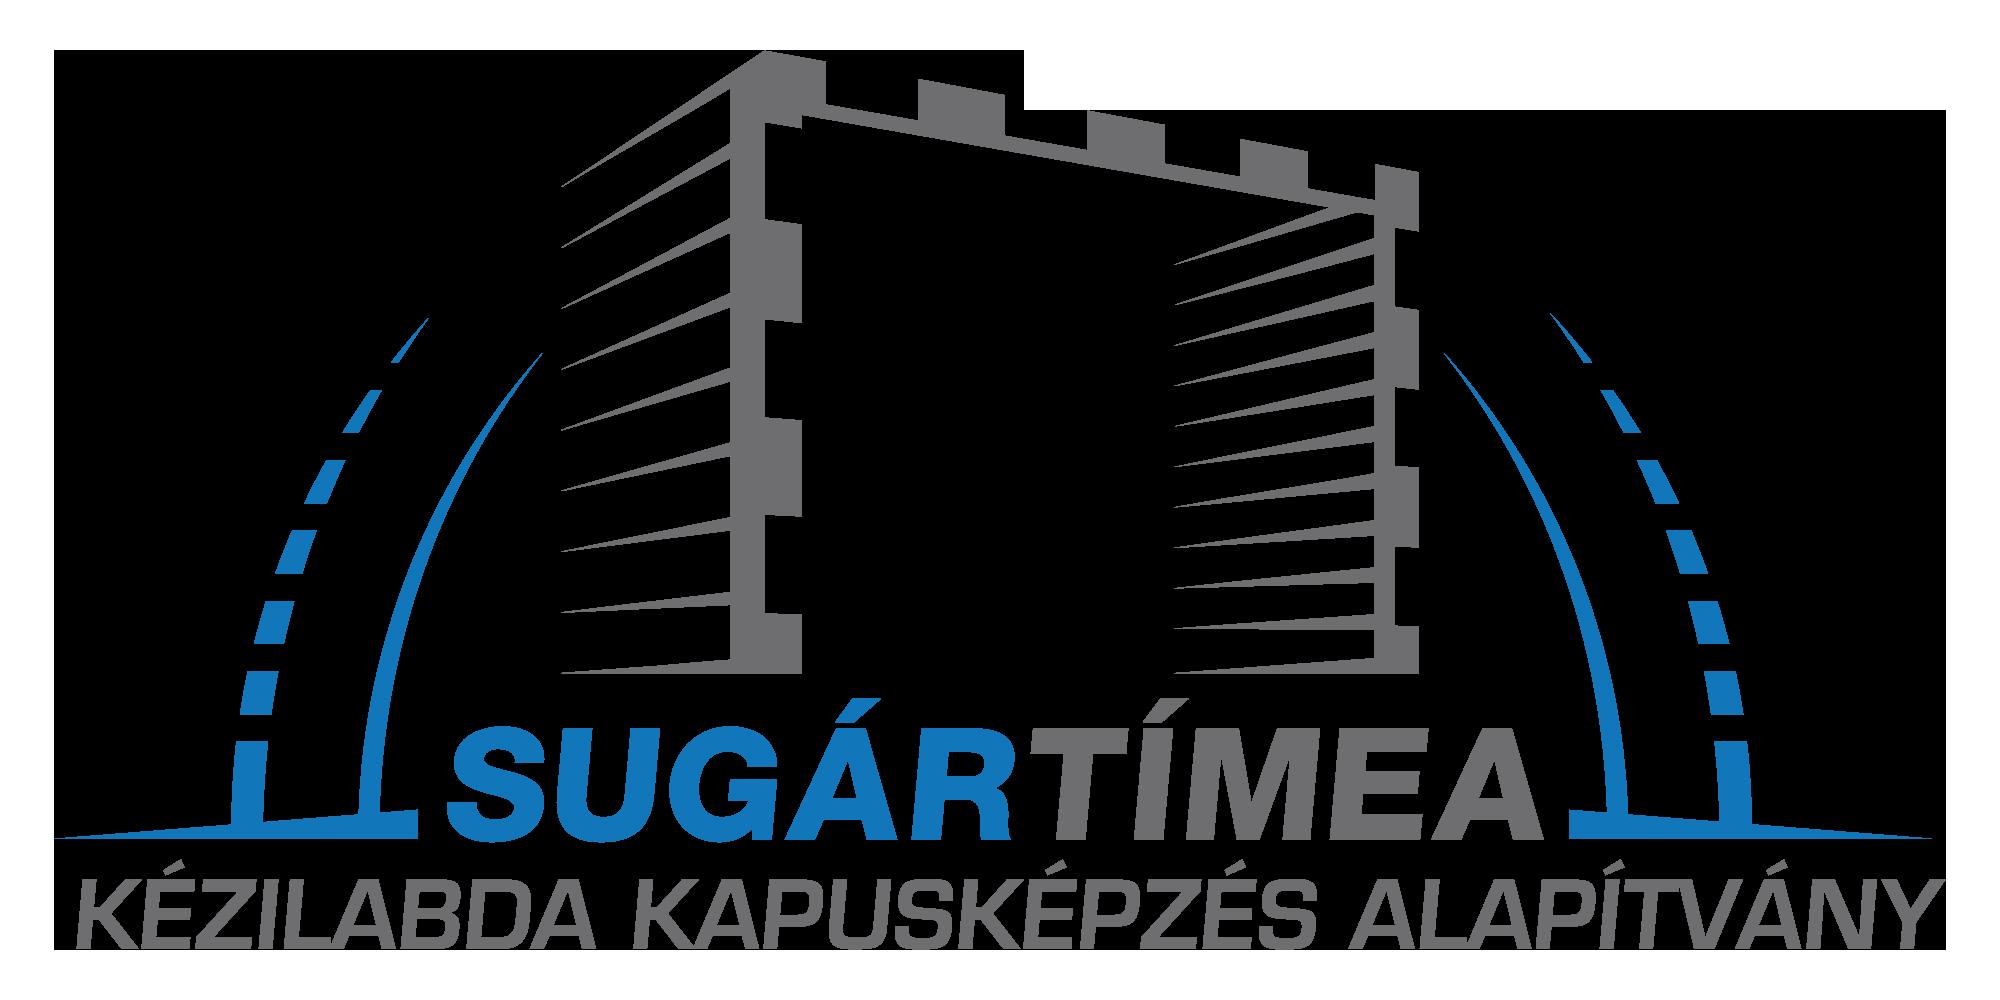 sugar_alapitvany_logo_color.png